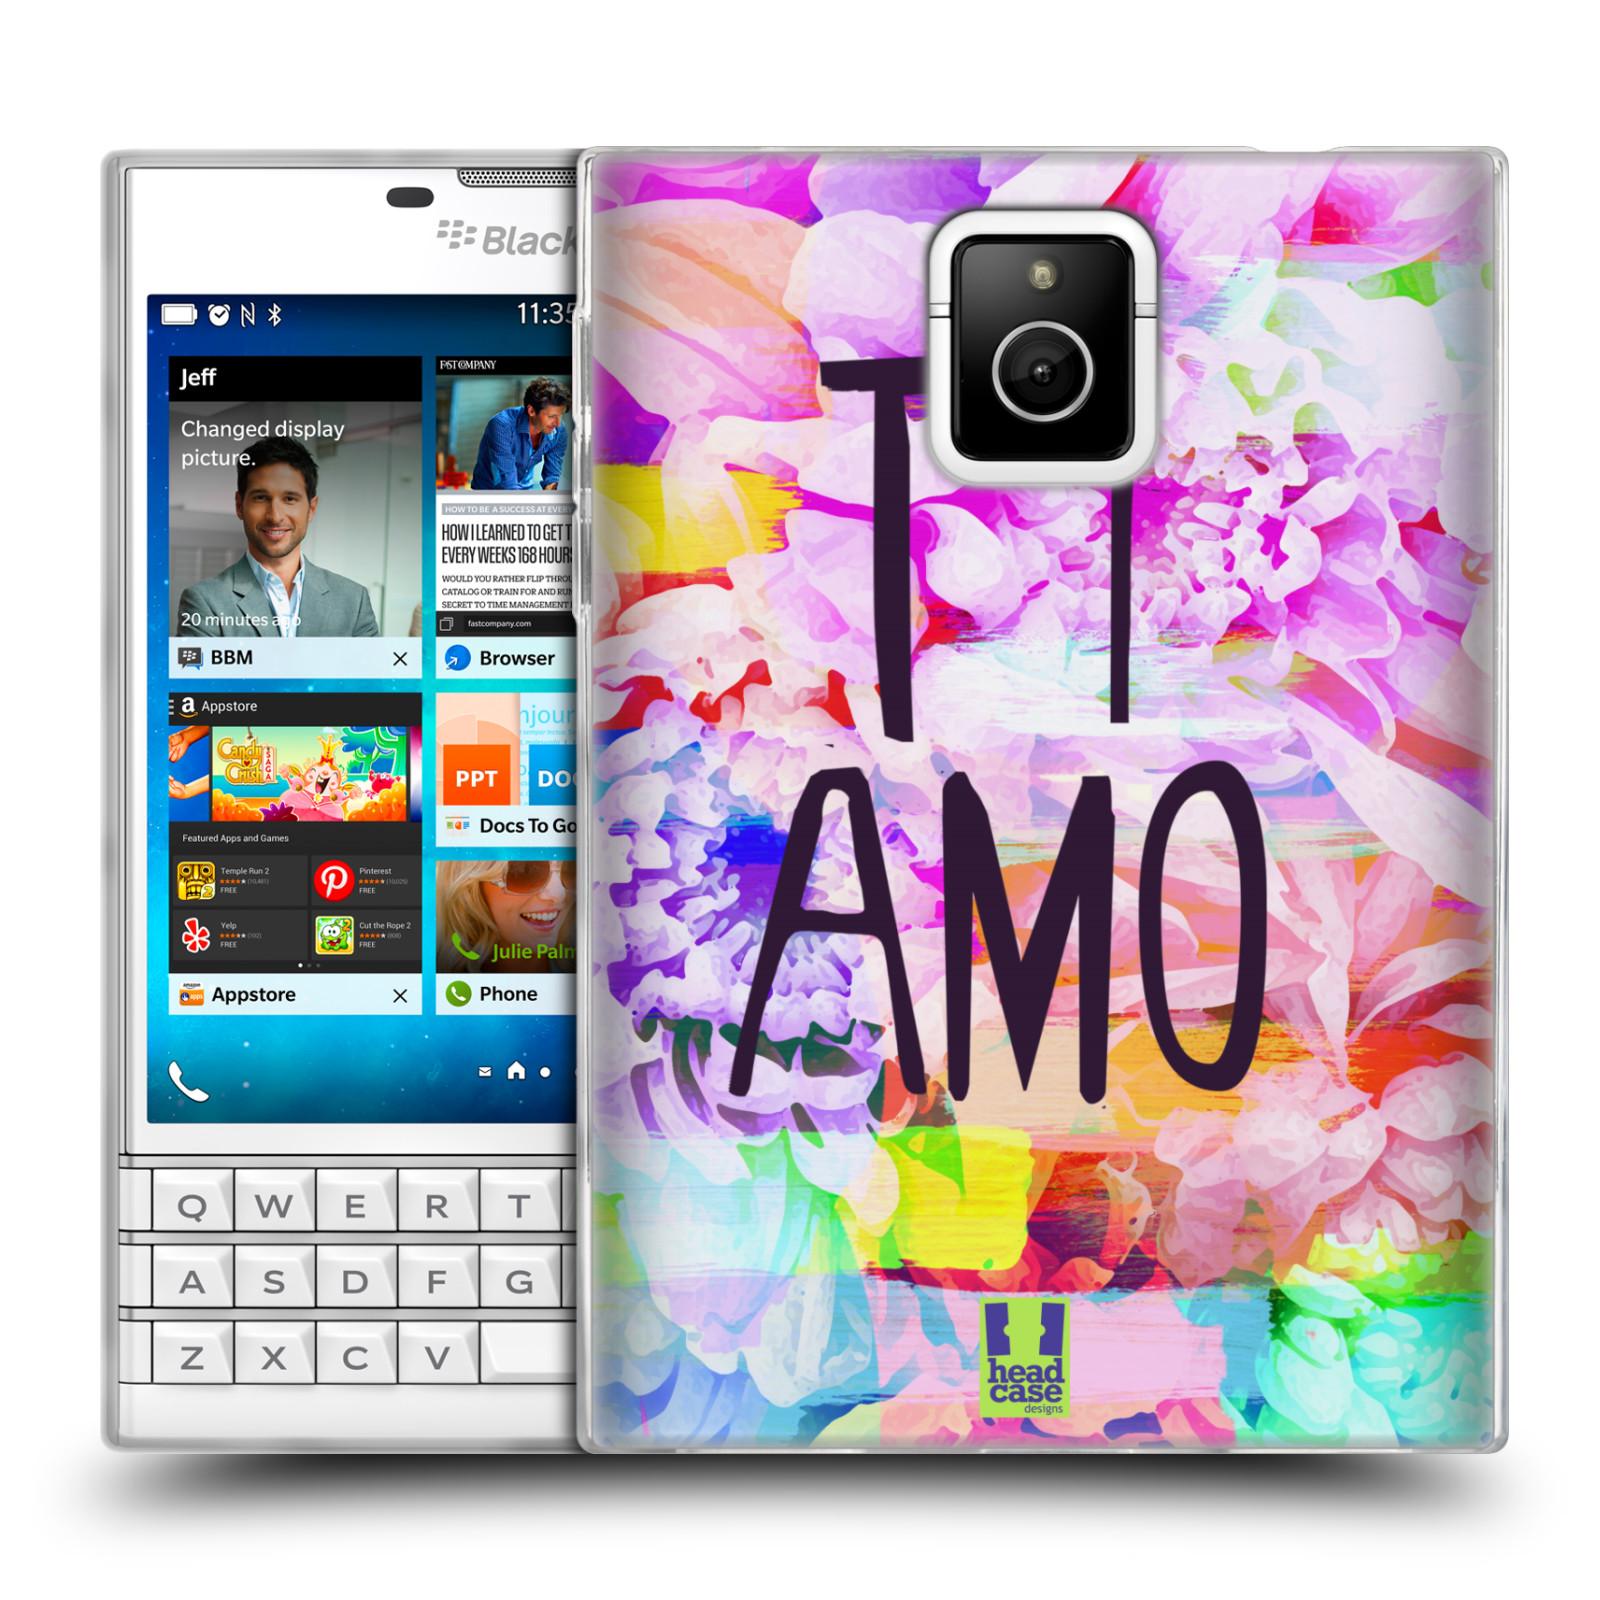 HEAD CASE silikonový obal na mobil Blackberry PASSPORT Láska a květy Ti Amo 0ceddd79e74